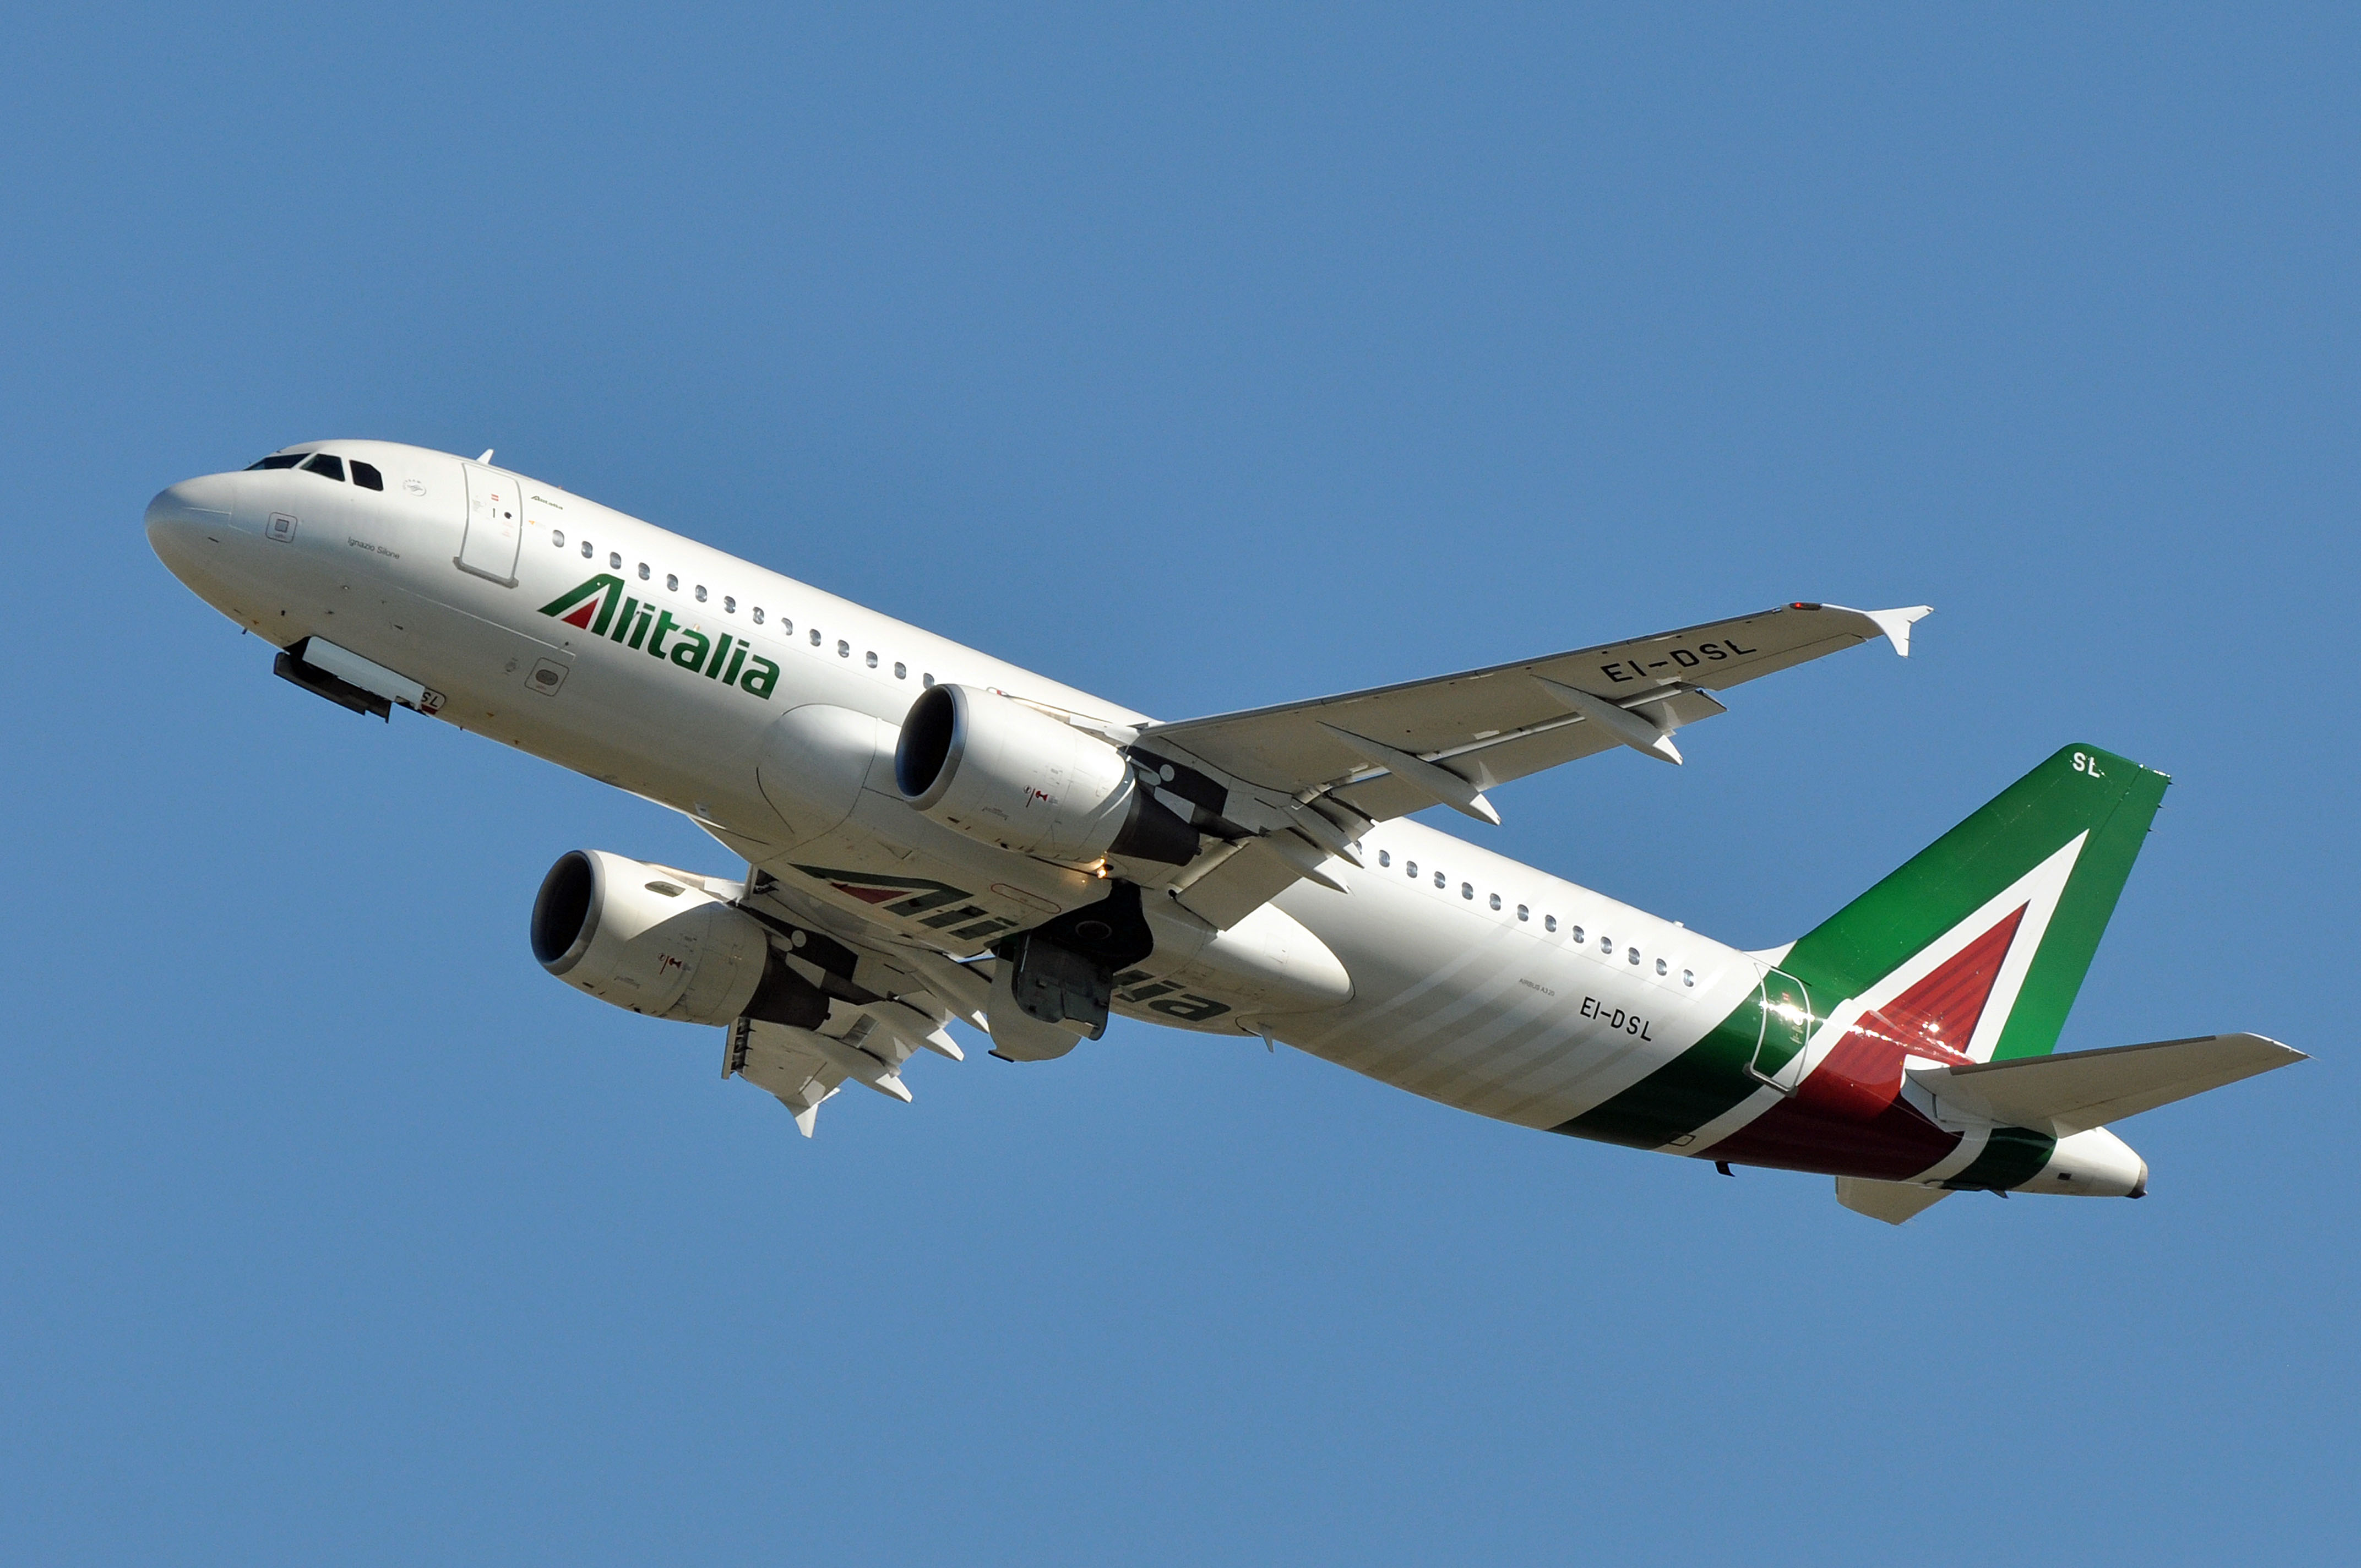 Alitalia Airbus A320-200. (Foto: ERIC SALARD |  Creative Commons Attribution-Share Alike 2.0 Generic)